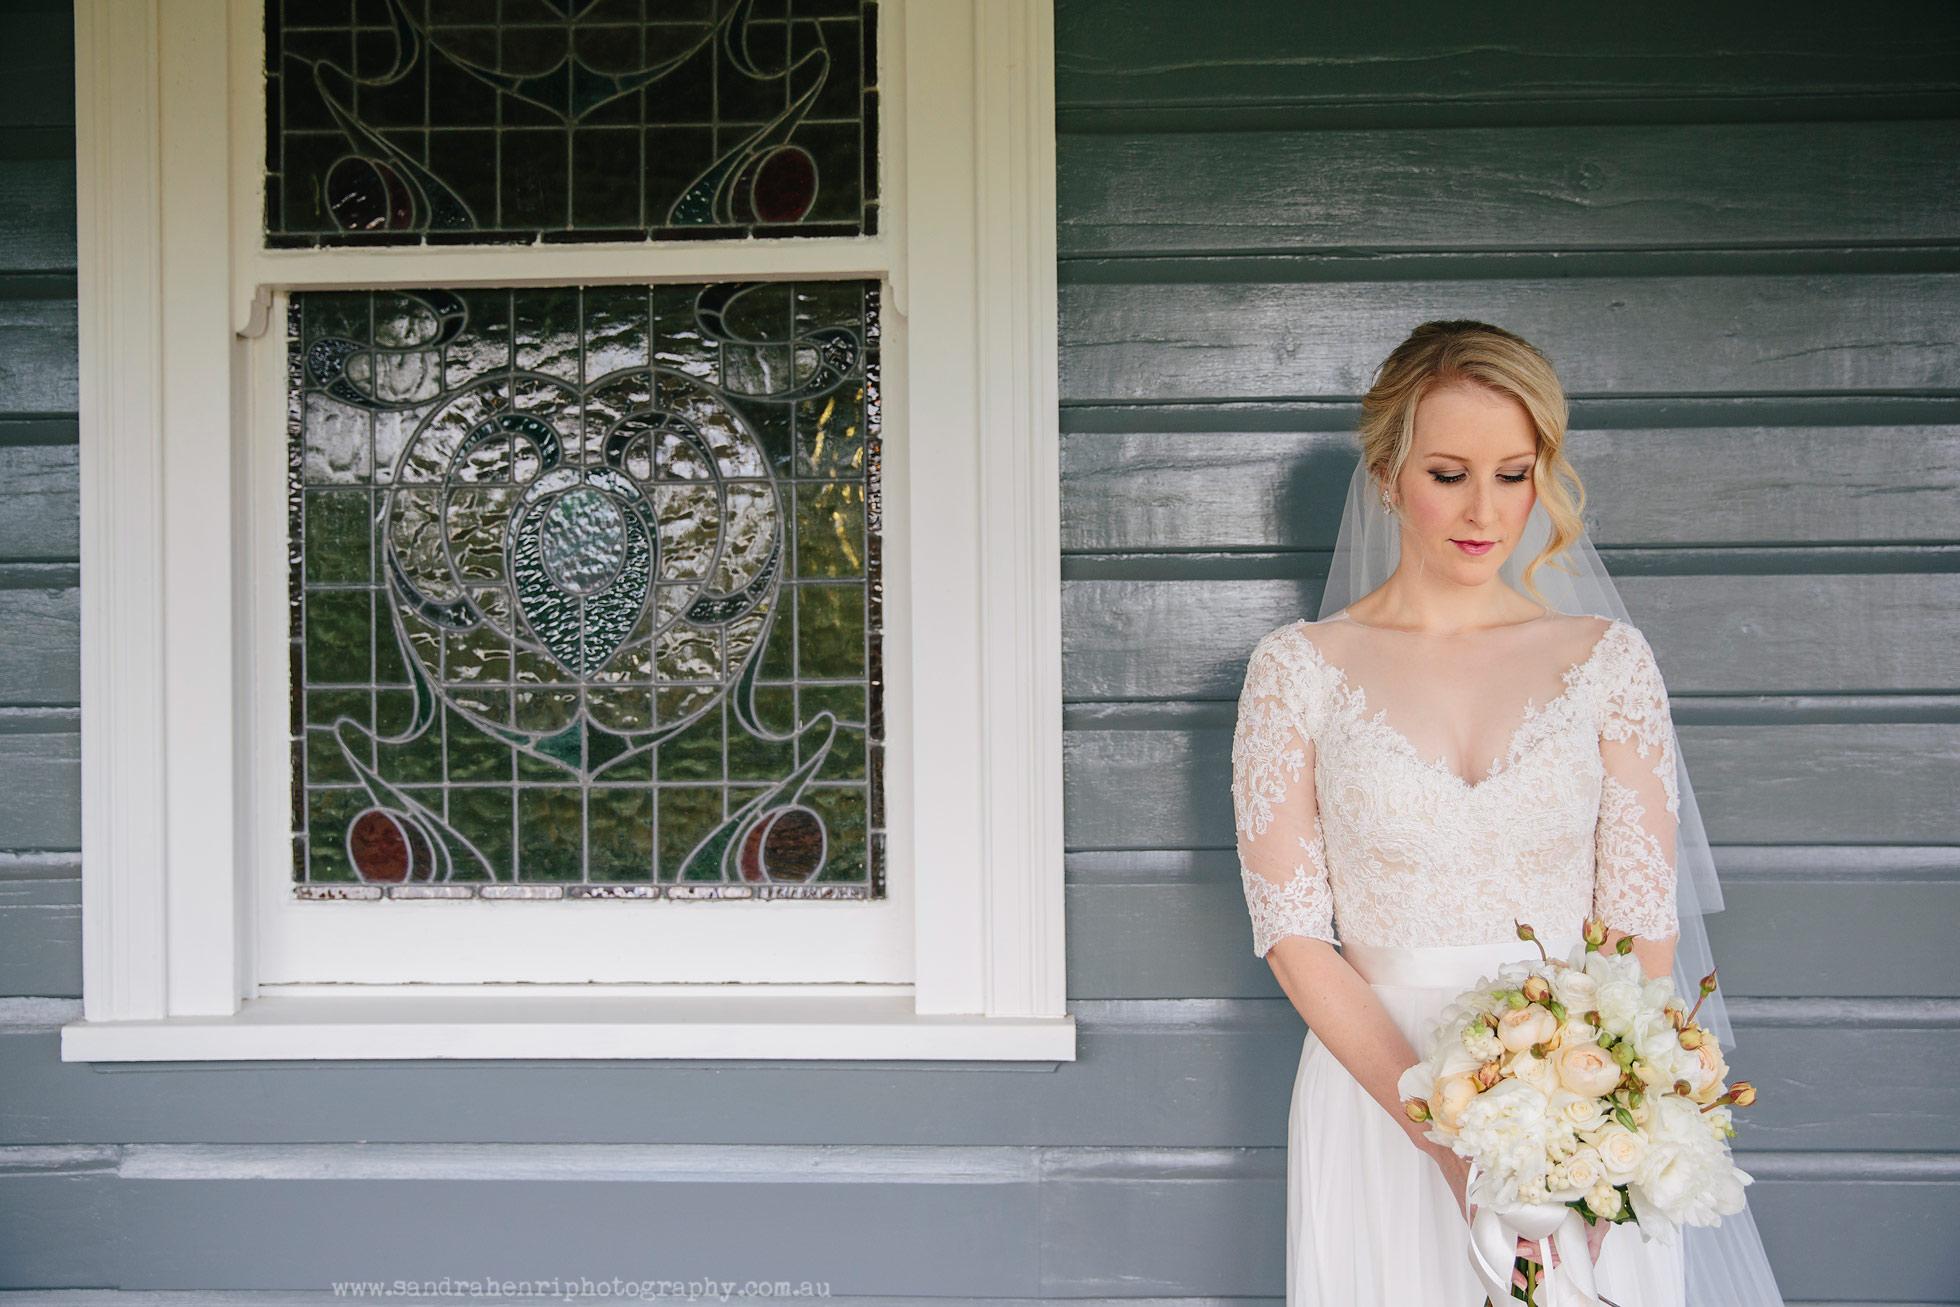 Roberts-Restaurant-garden-wedding-images-11.jpg